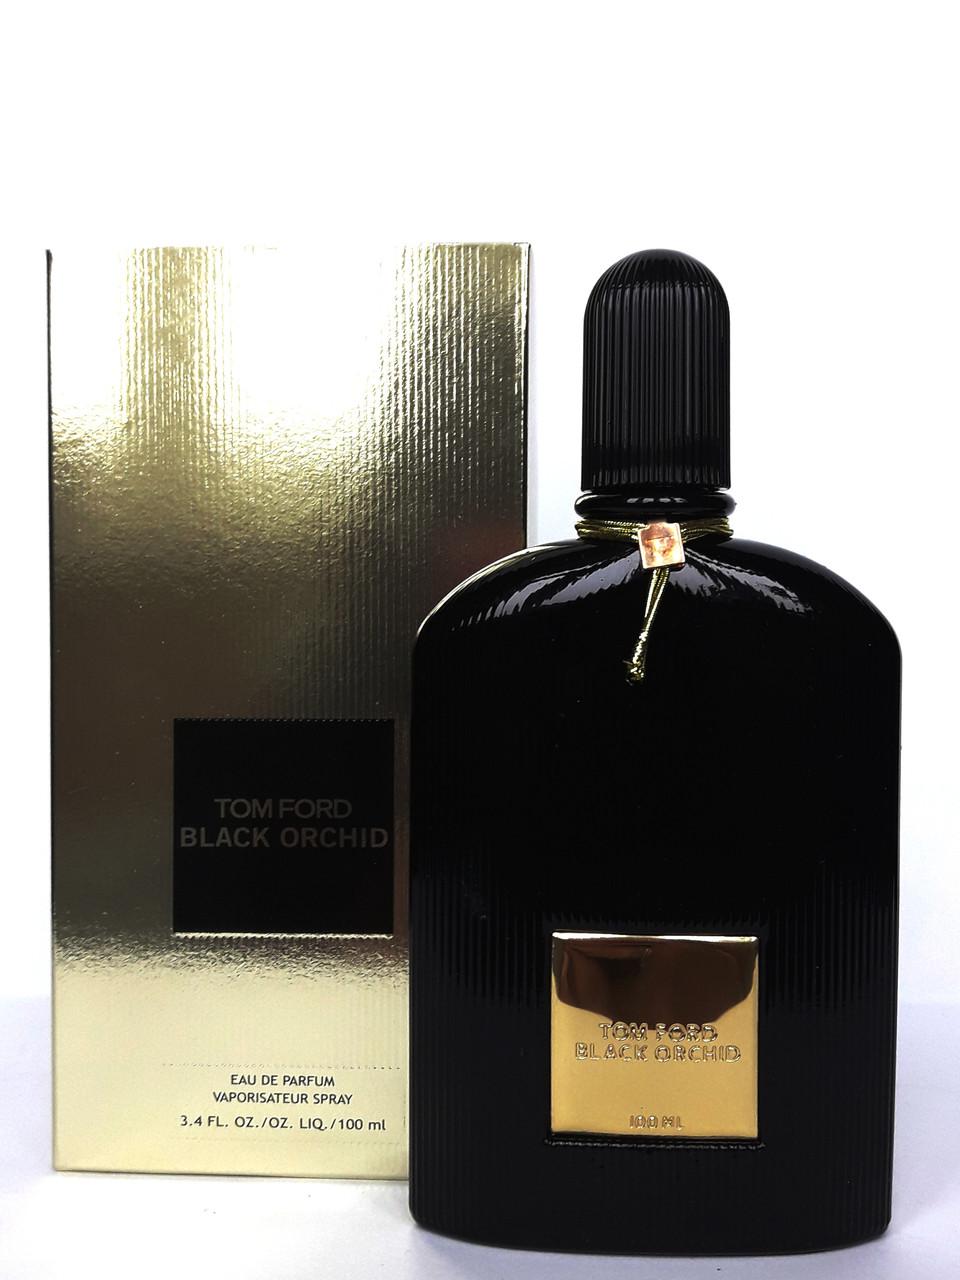 духи Tom Ford Black Orchid цена 1 755 грн купить в киеве Prom